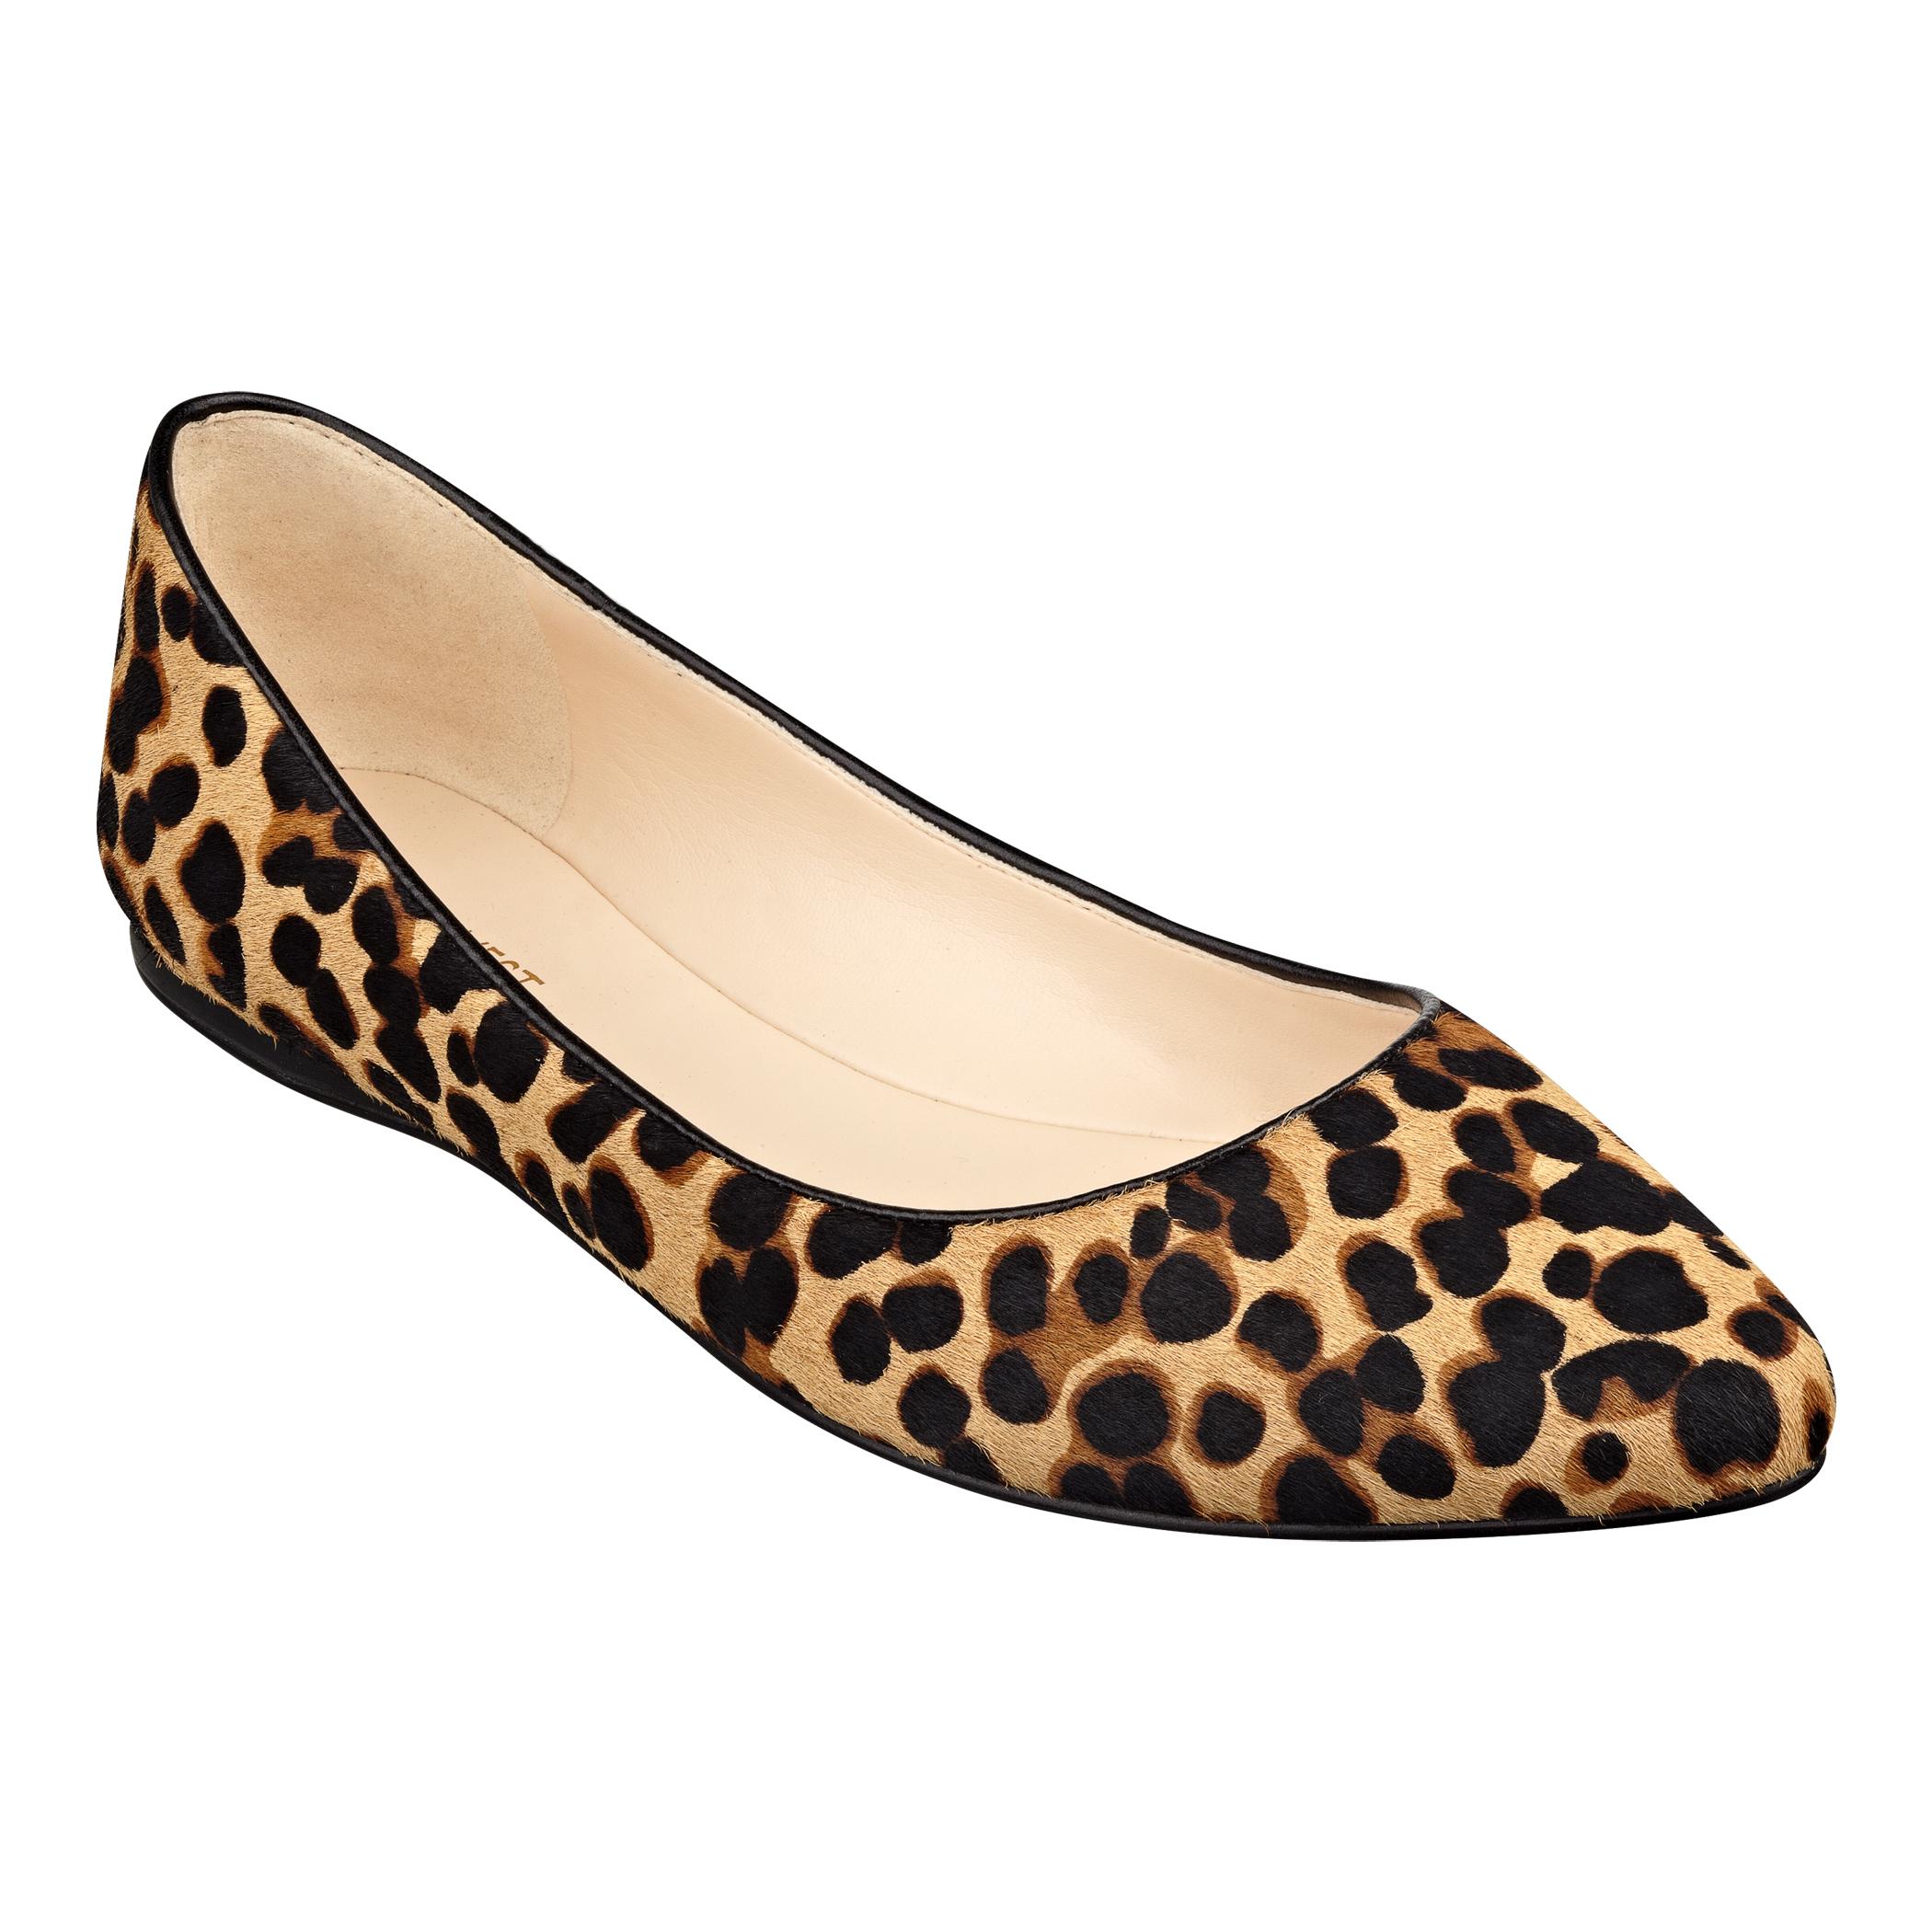 Nine West Womens Shoes Uk